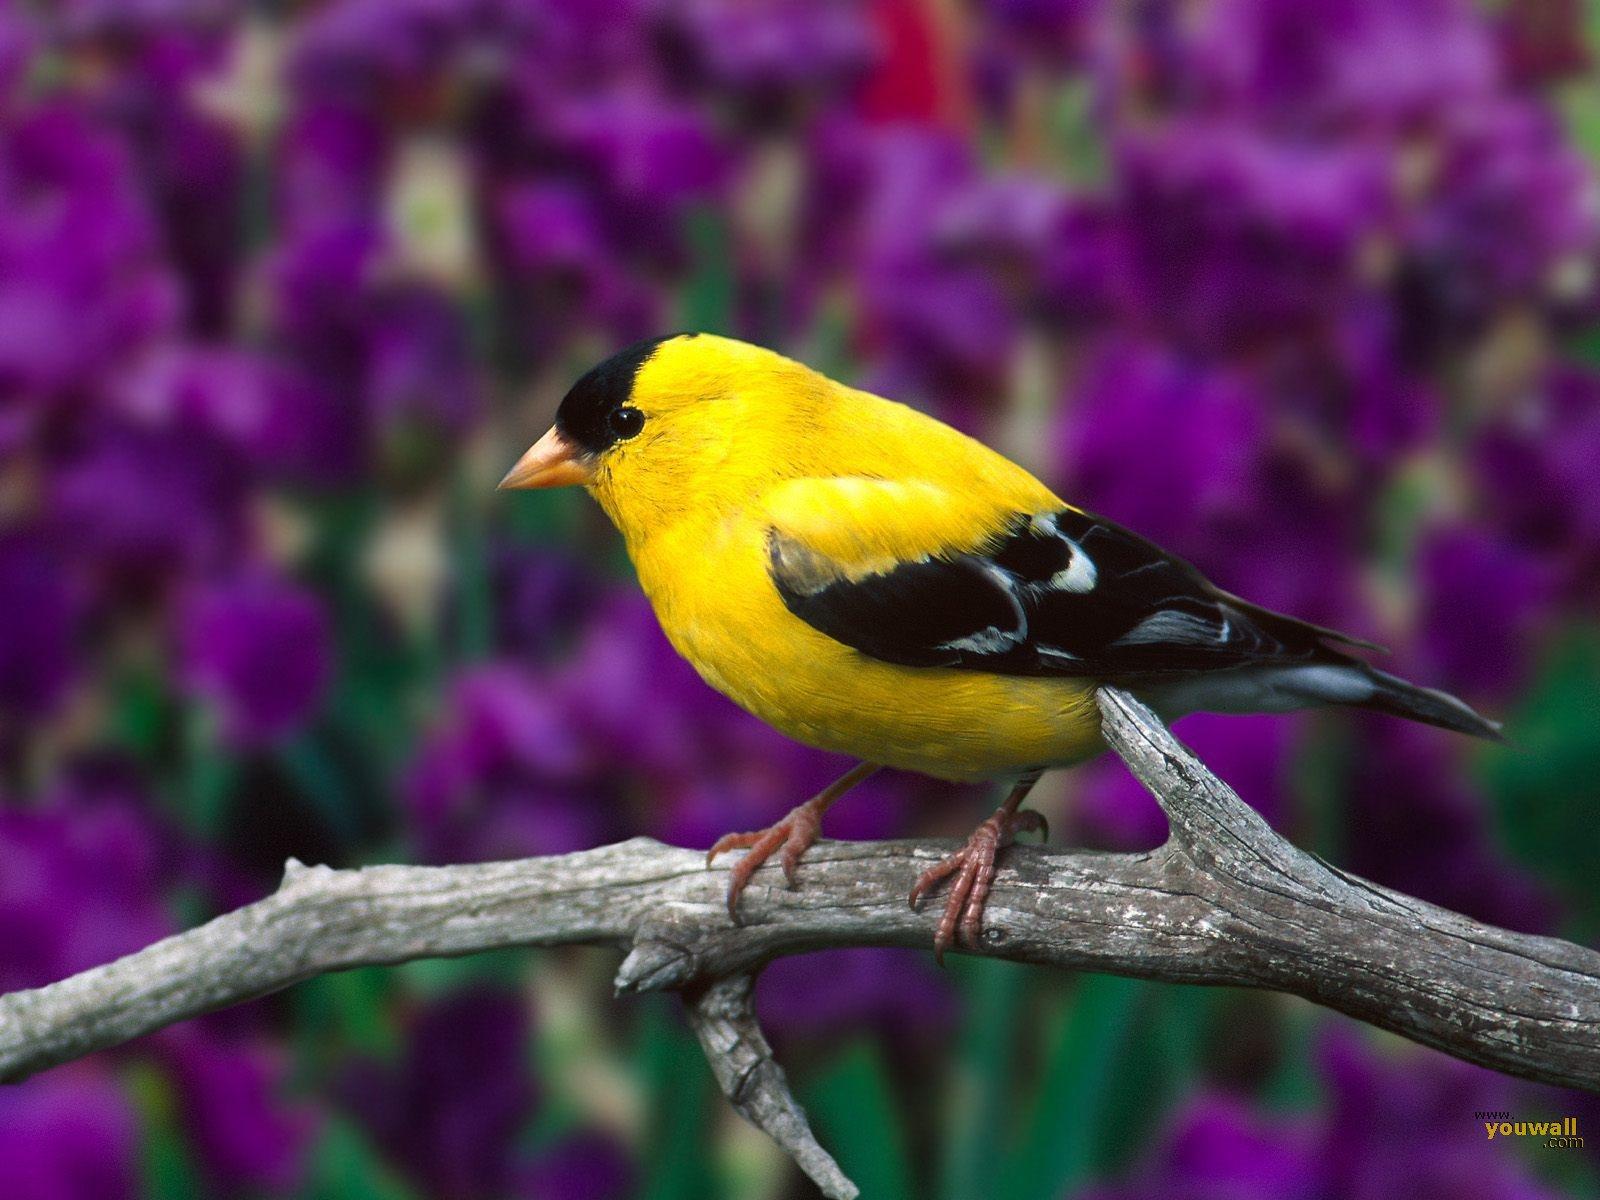 http://1.bp.blogspot.com/-cjijsLMSy5c/Tbatyz3a3VI/AAAAAAAAK2Q/xKGevCz8UfA/s1600/beautiful-birds-wallpapers_beautiful-bird-wallpaper.jpg